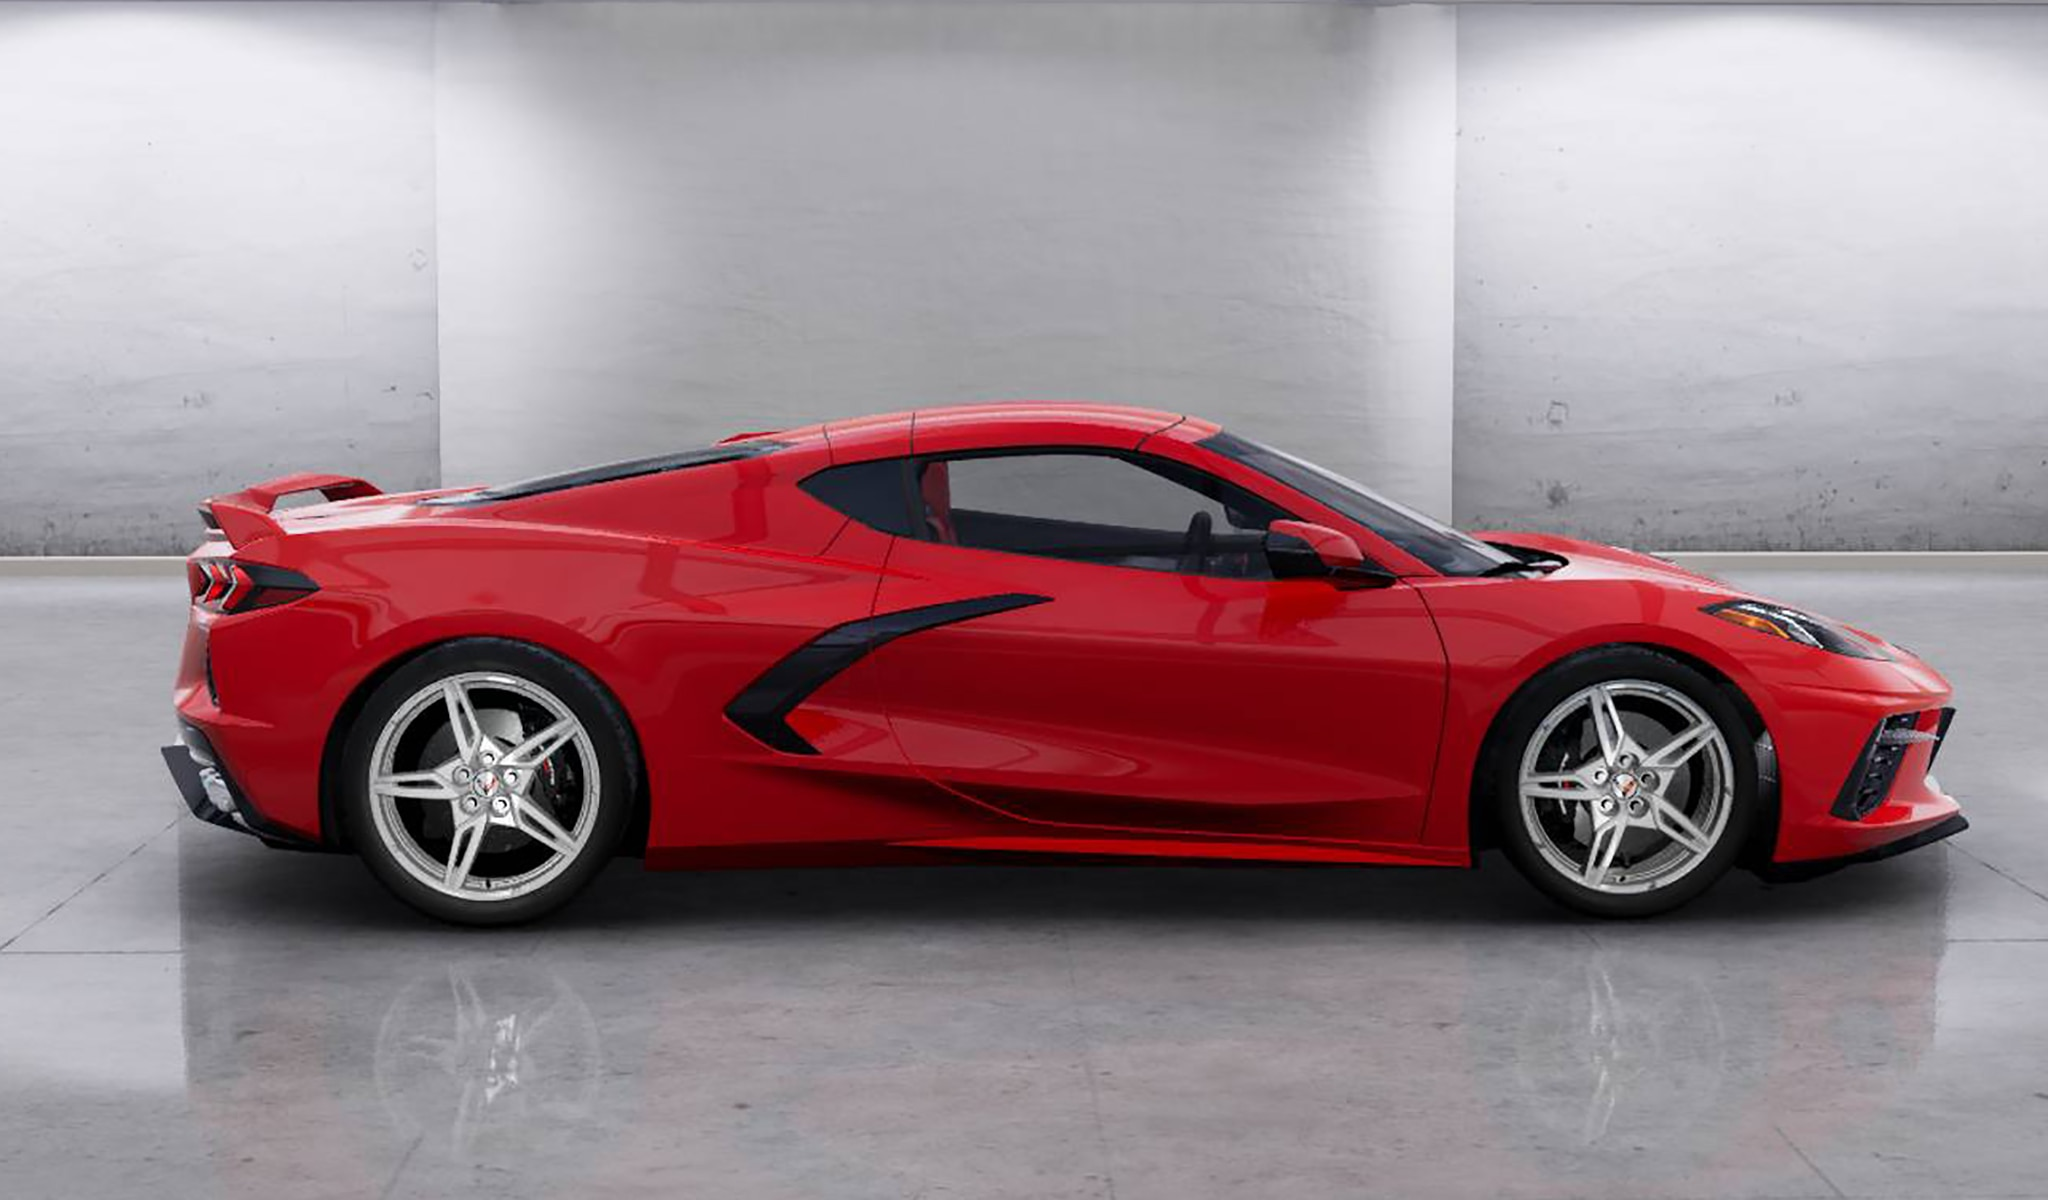 2020 C8 Chevrolet Corvette Stingray All The Colors